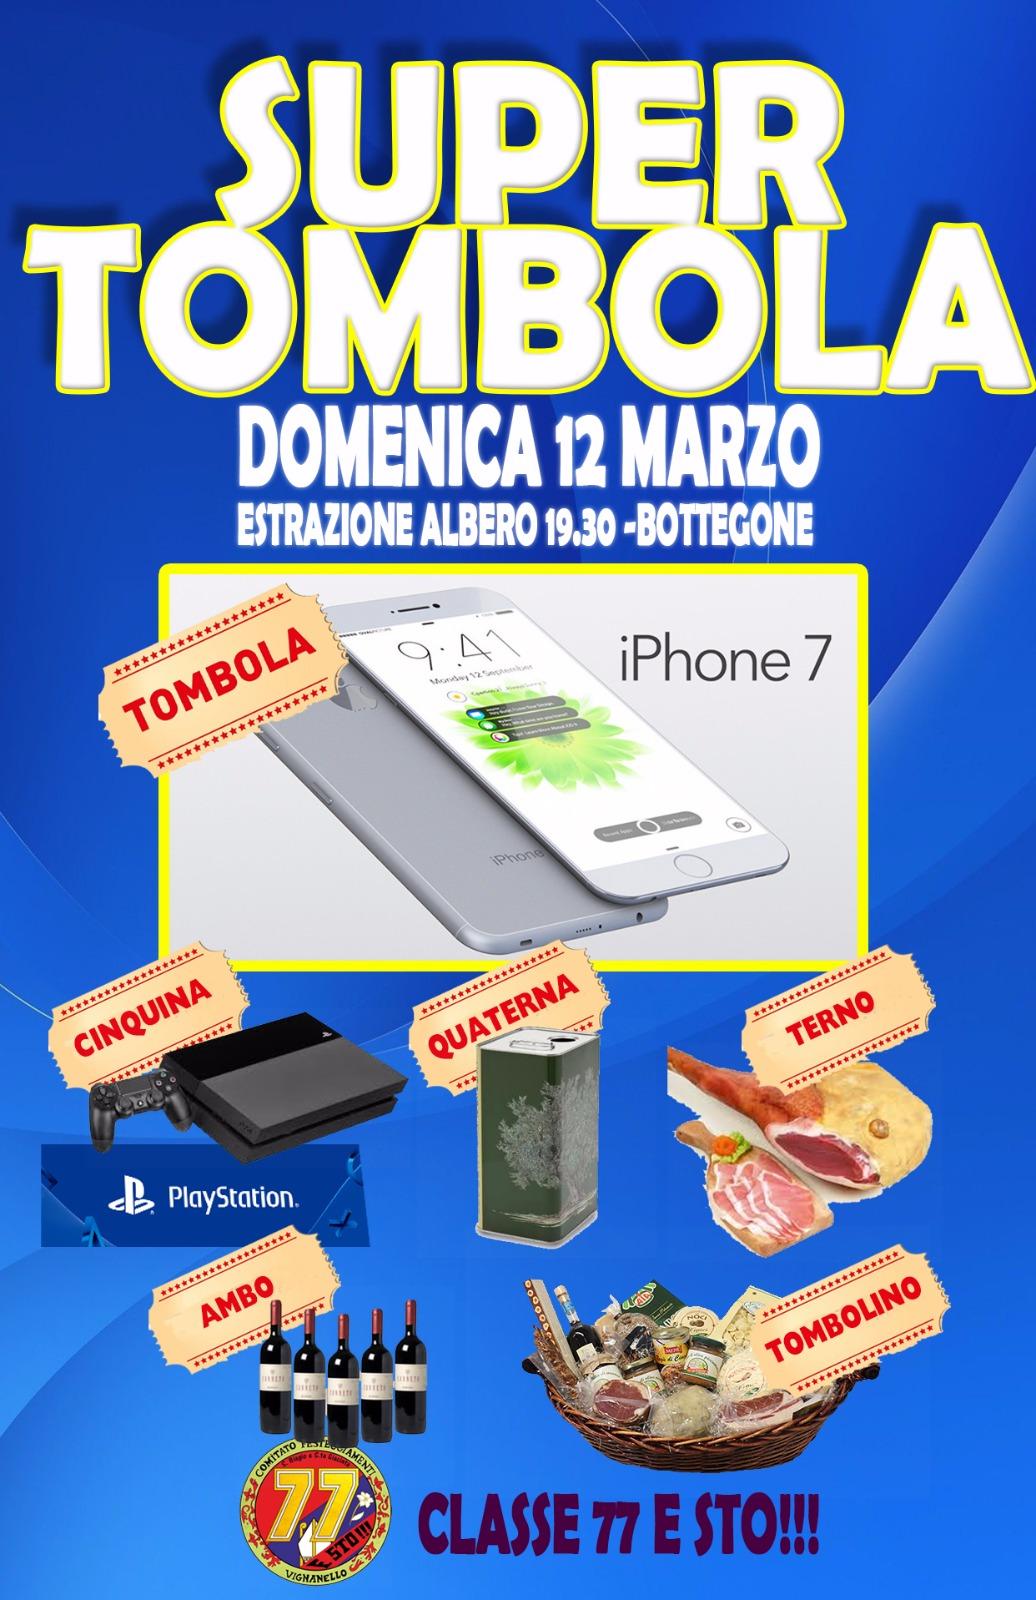 SuperTombola_20170312